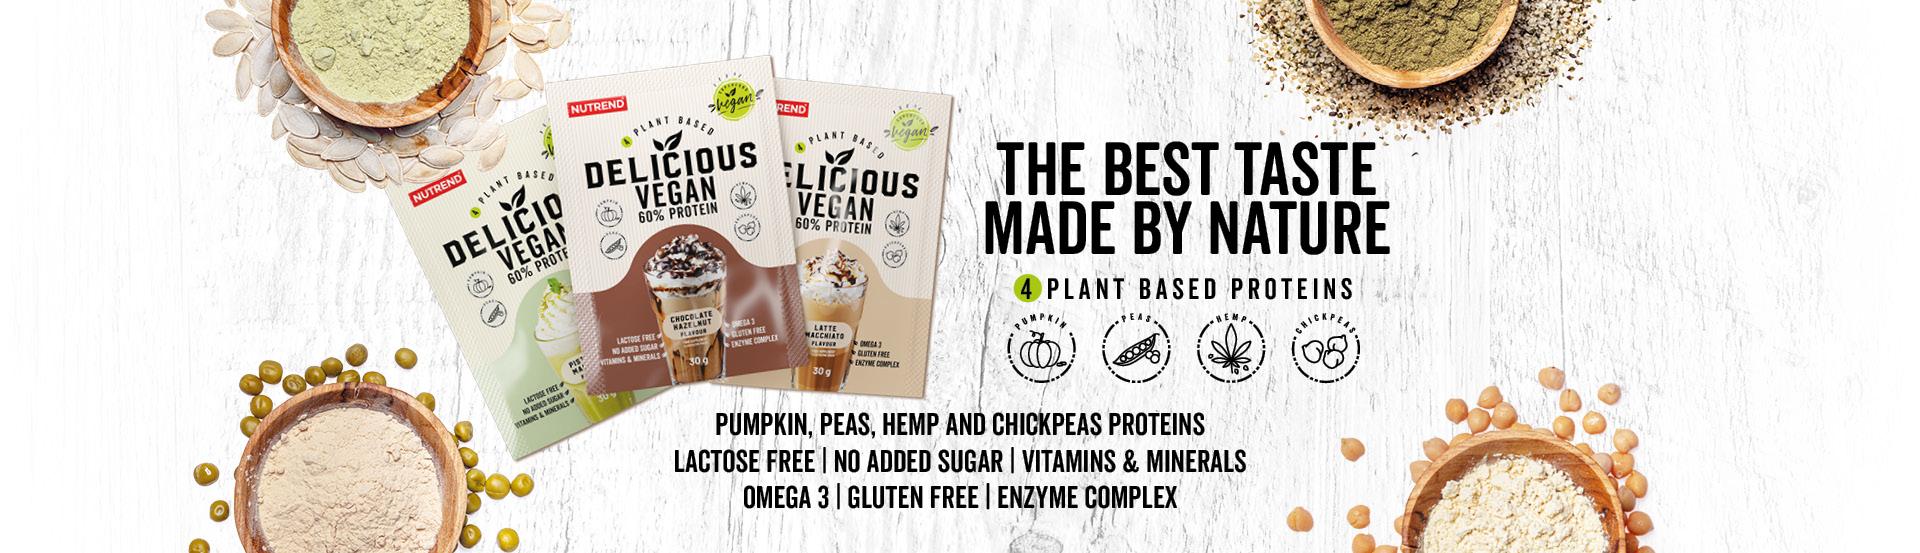 Banner delicious Vegan Protein